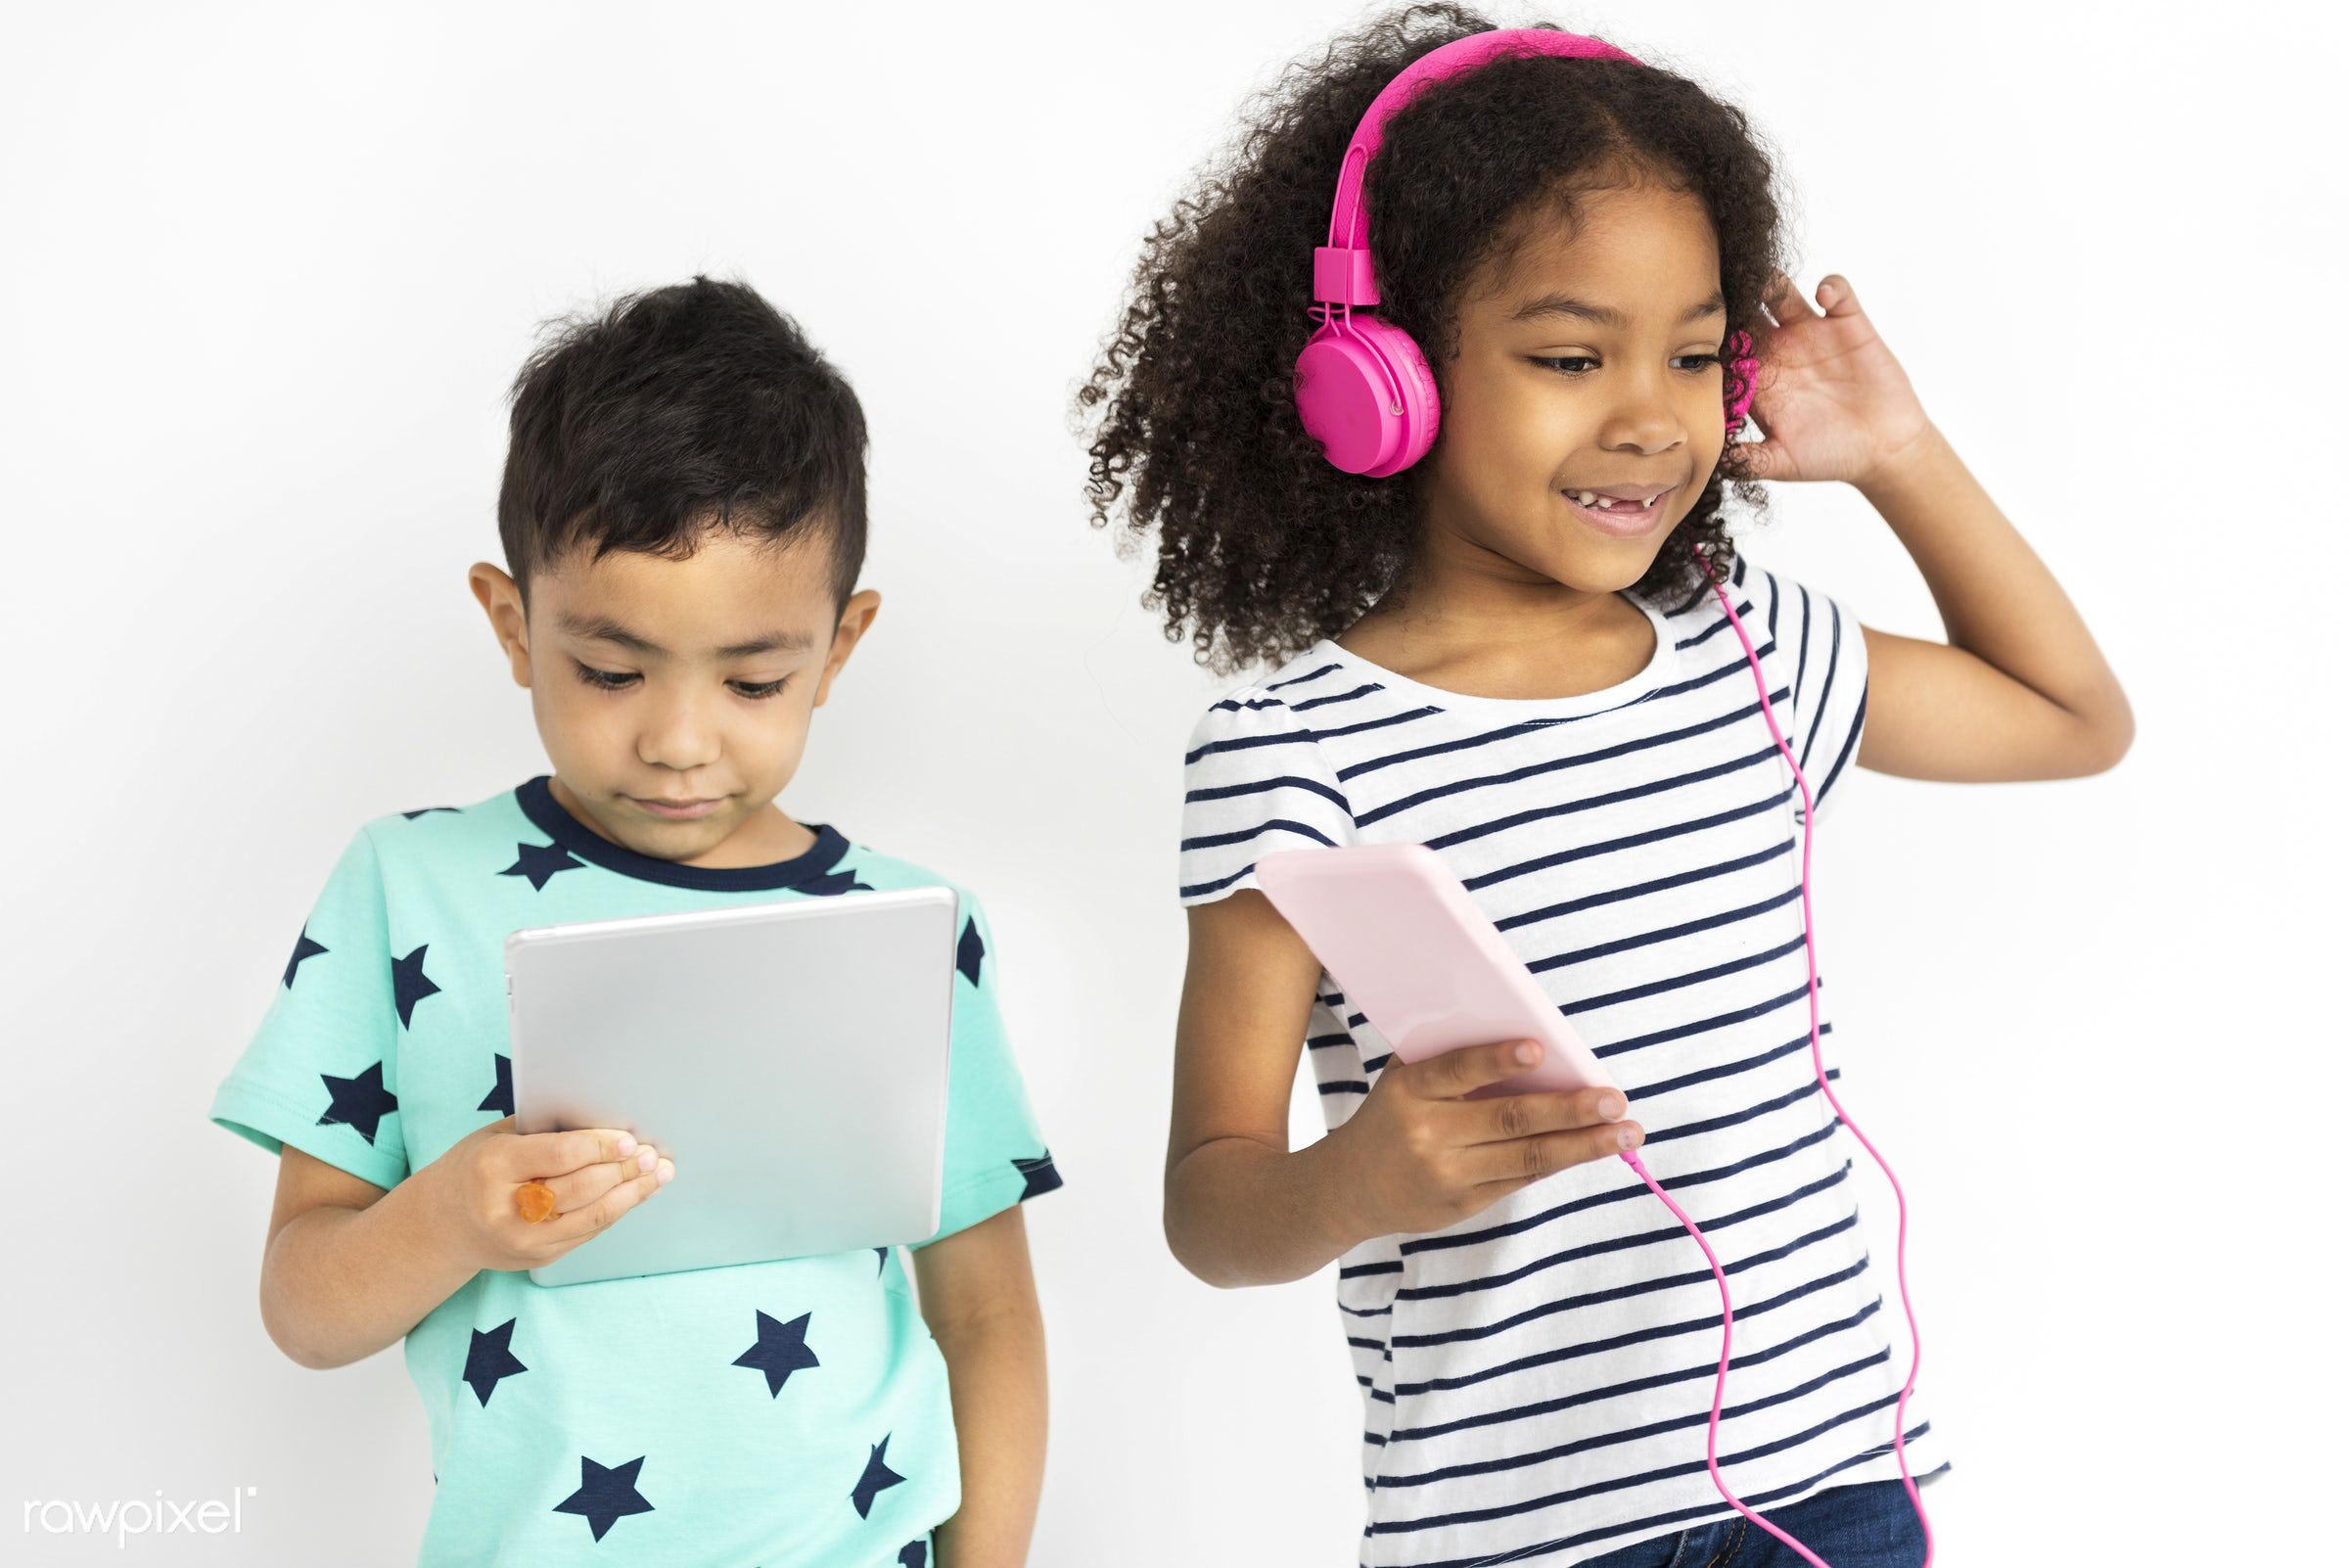 studio, expression, model, person, technology, children, little, cute, digital, people, kid, sister, wireless, friends,...